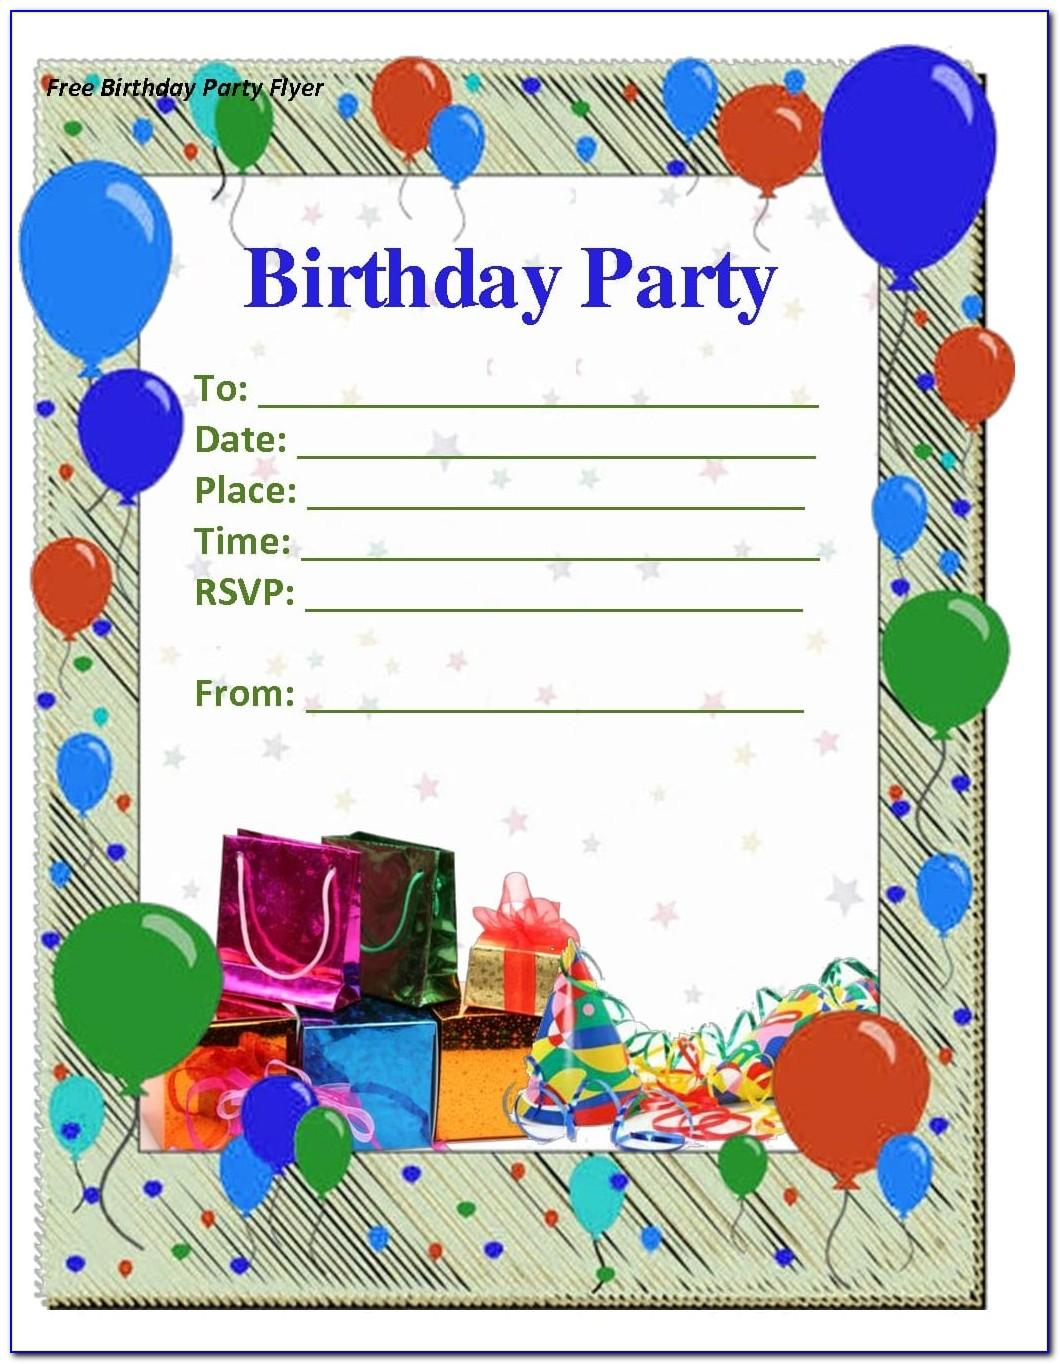 Birthday Invitation Card Background Download